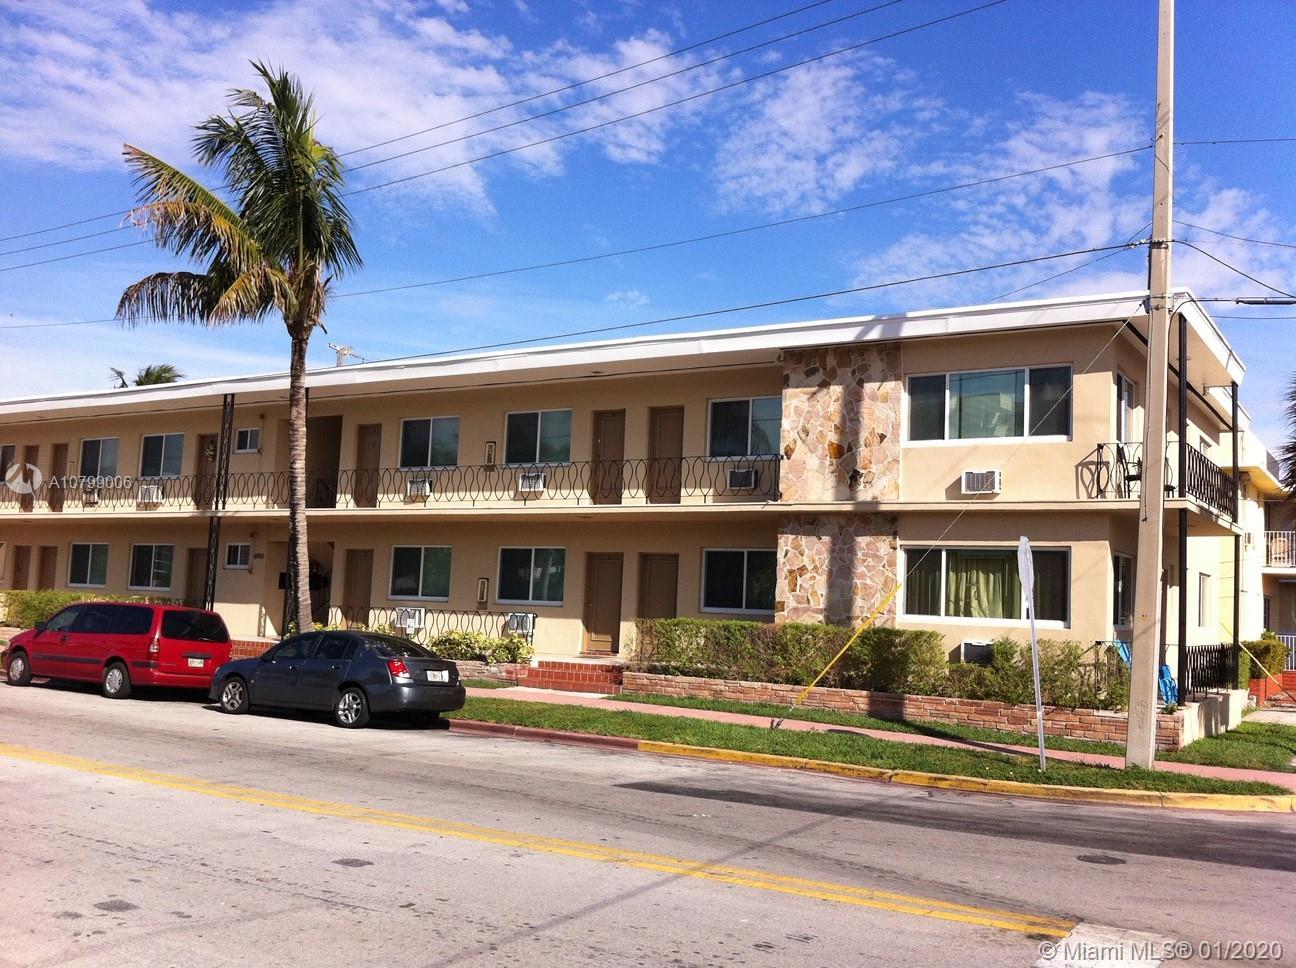 6901 Indian Creek Drive, Miami Beach, Florida 33141